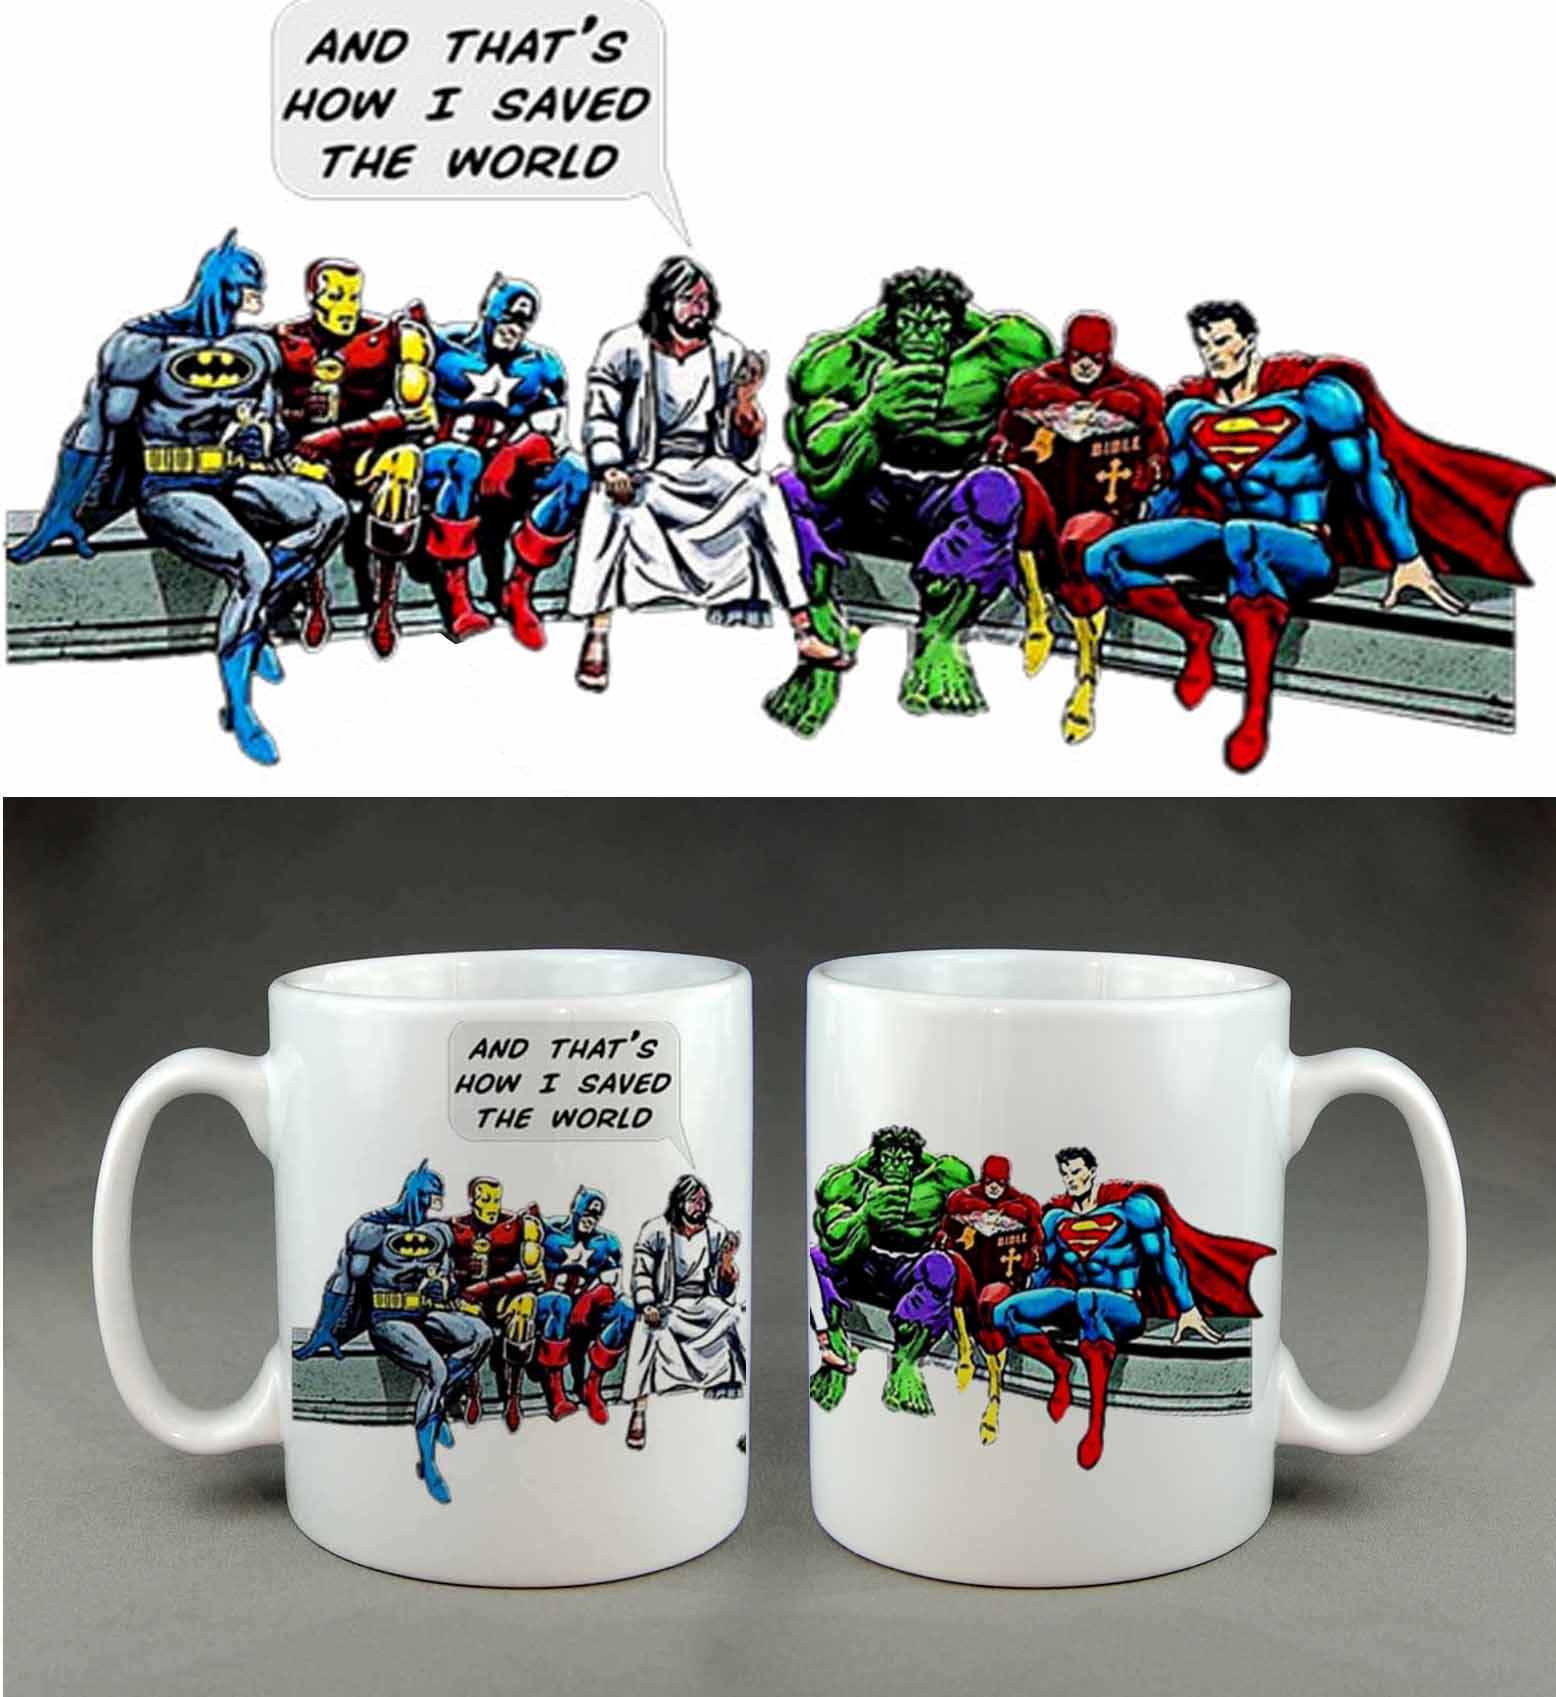 And thats how I saved the world super hero coffee mug